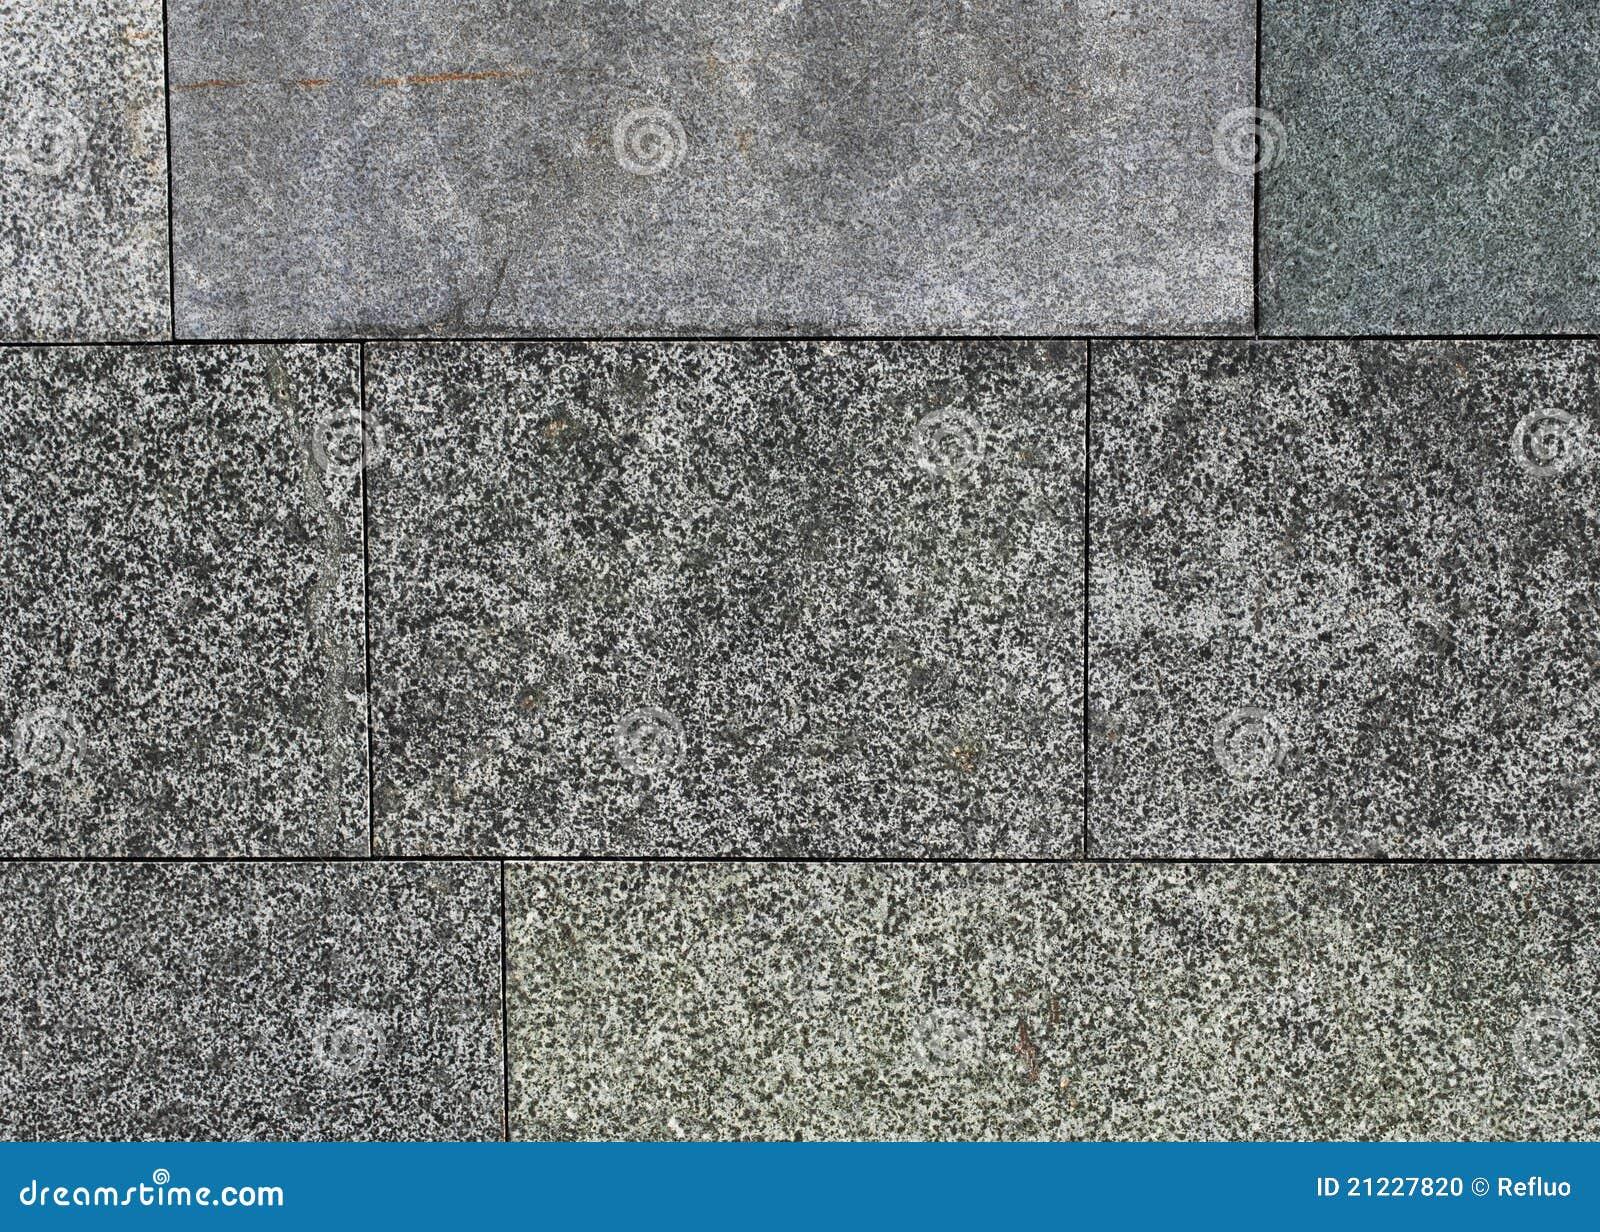 blocs de pierre photo stock image 21227820. Black Bedroom Furniture Sets. Home Design Ideas